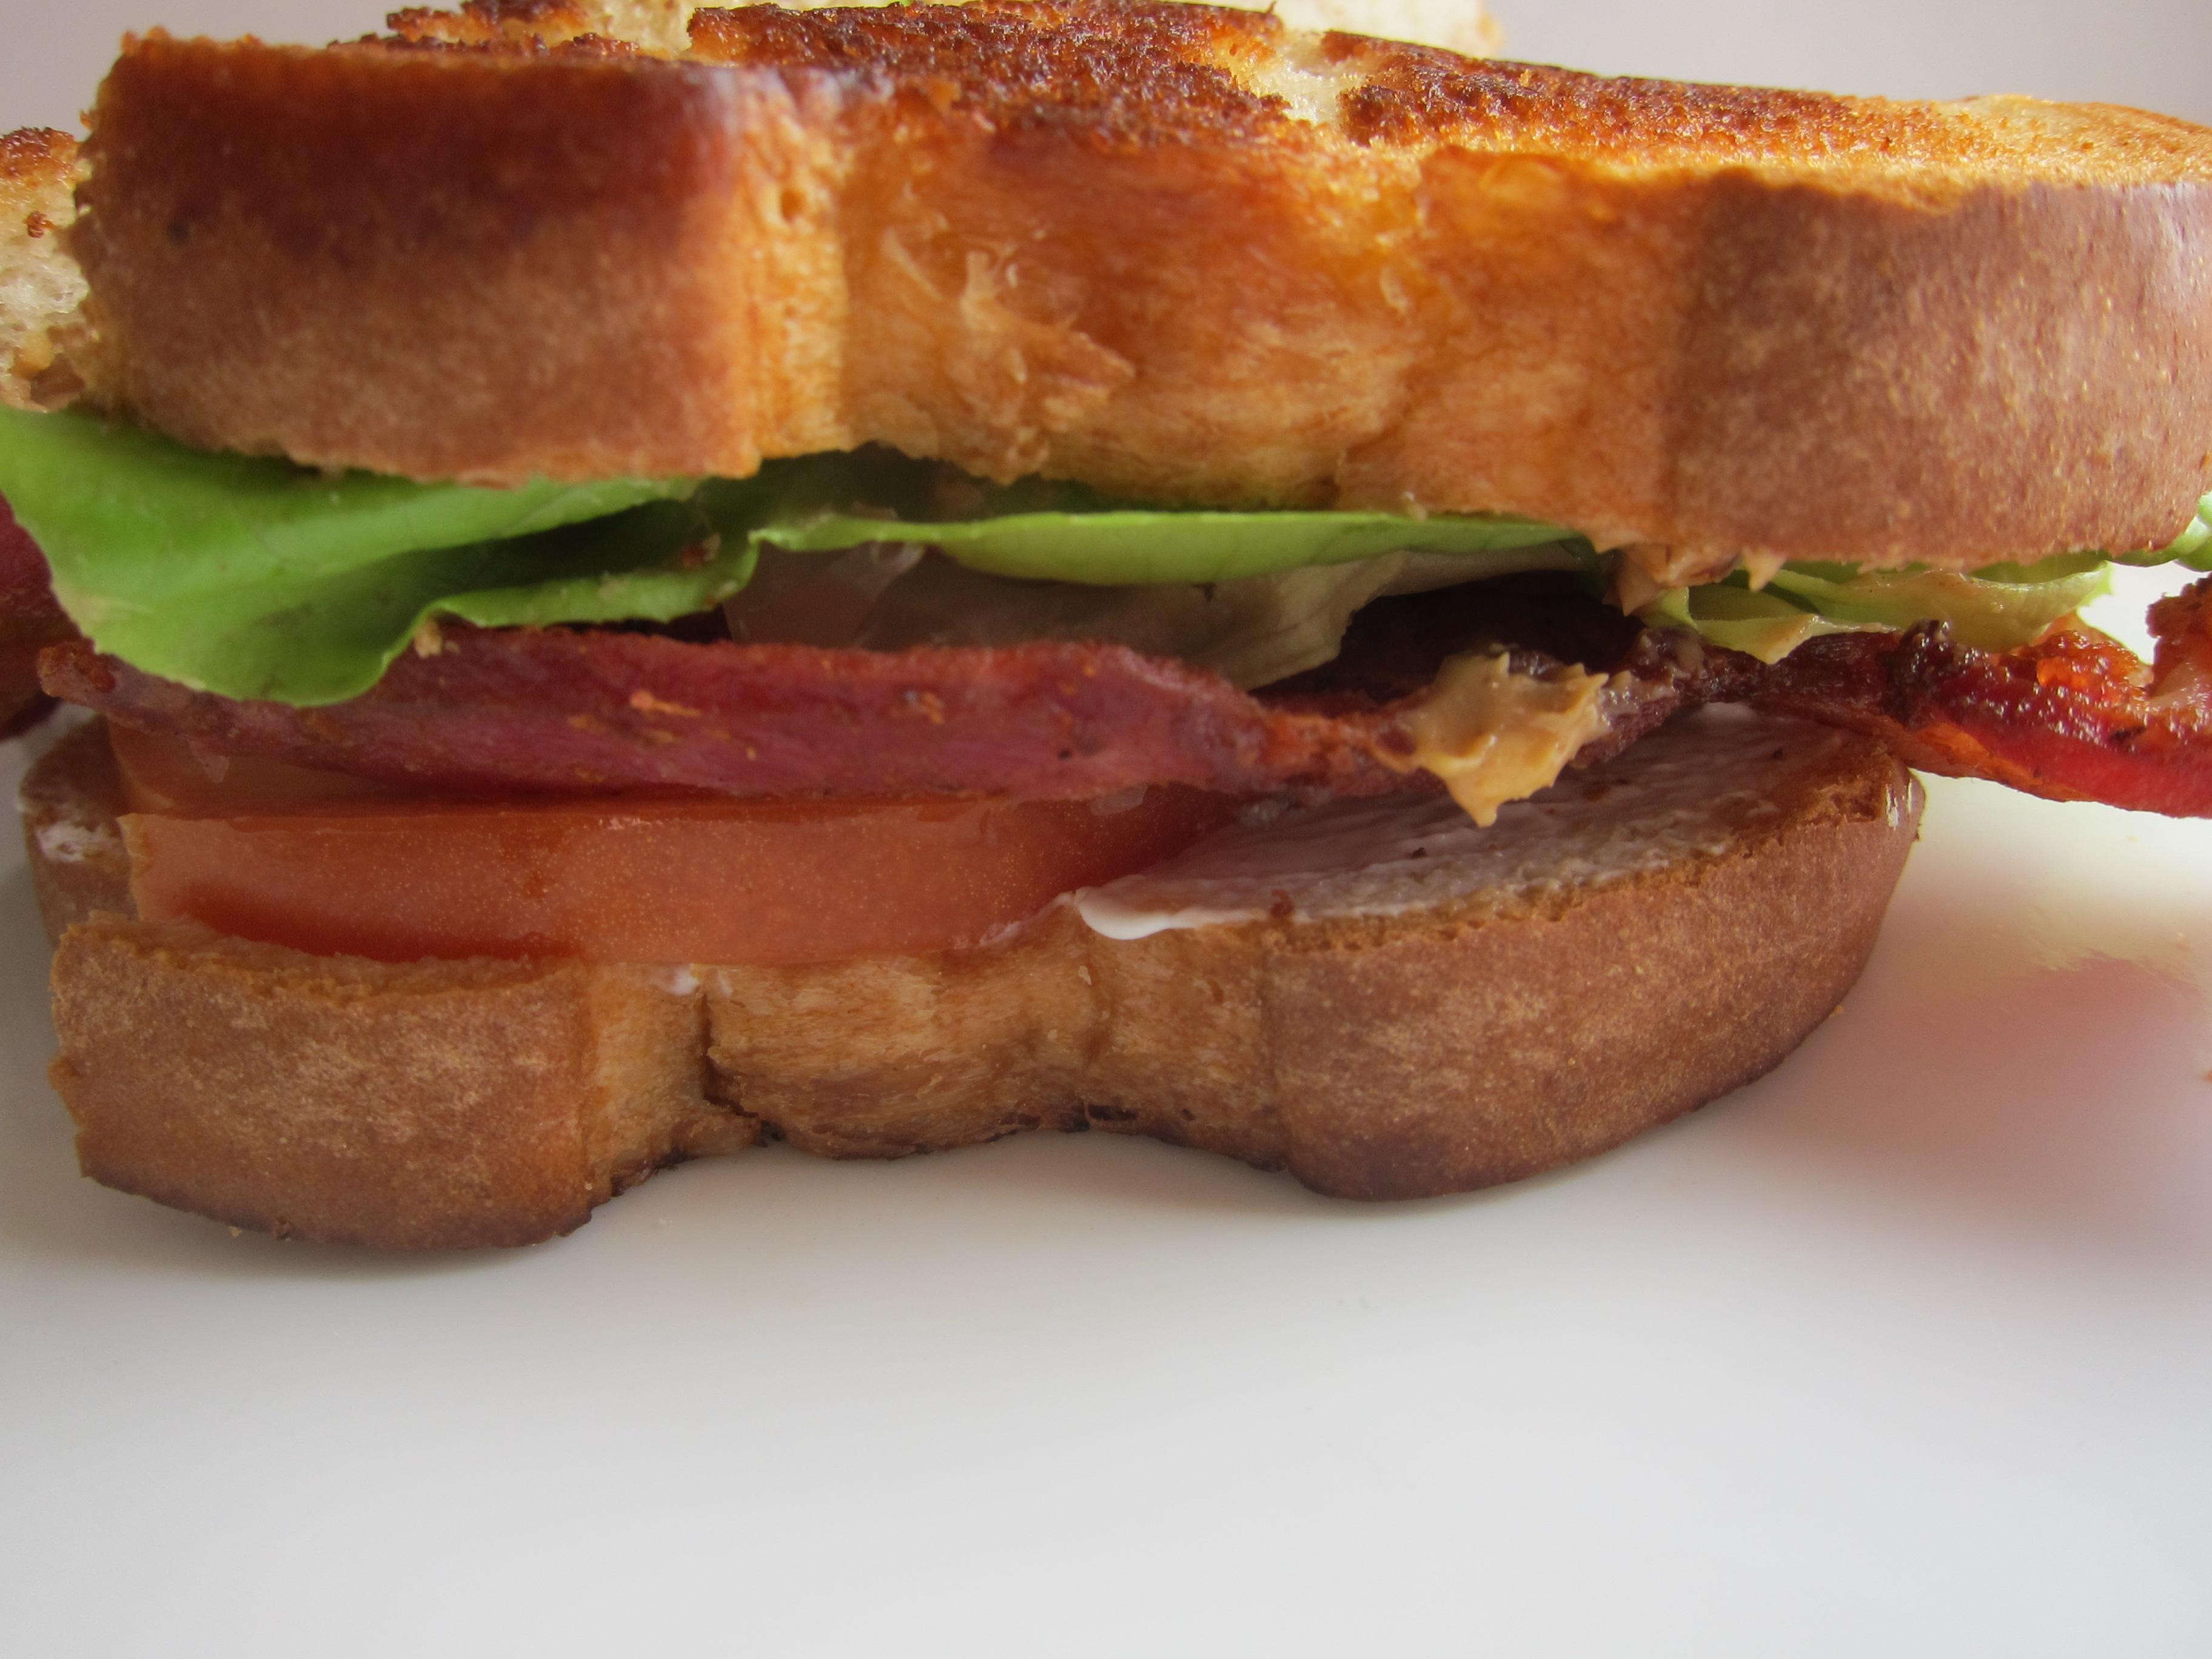 PBBLTS – Peanut Butter, Bacon, Lettuce, Tomato, Sour Cream – Sandwich